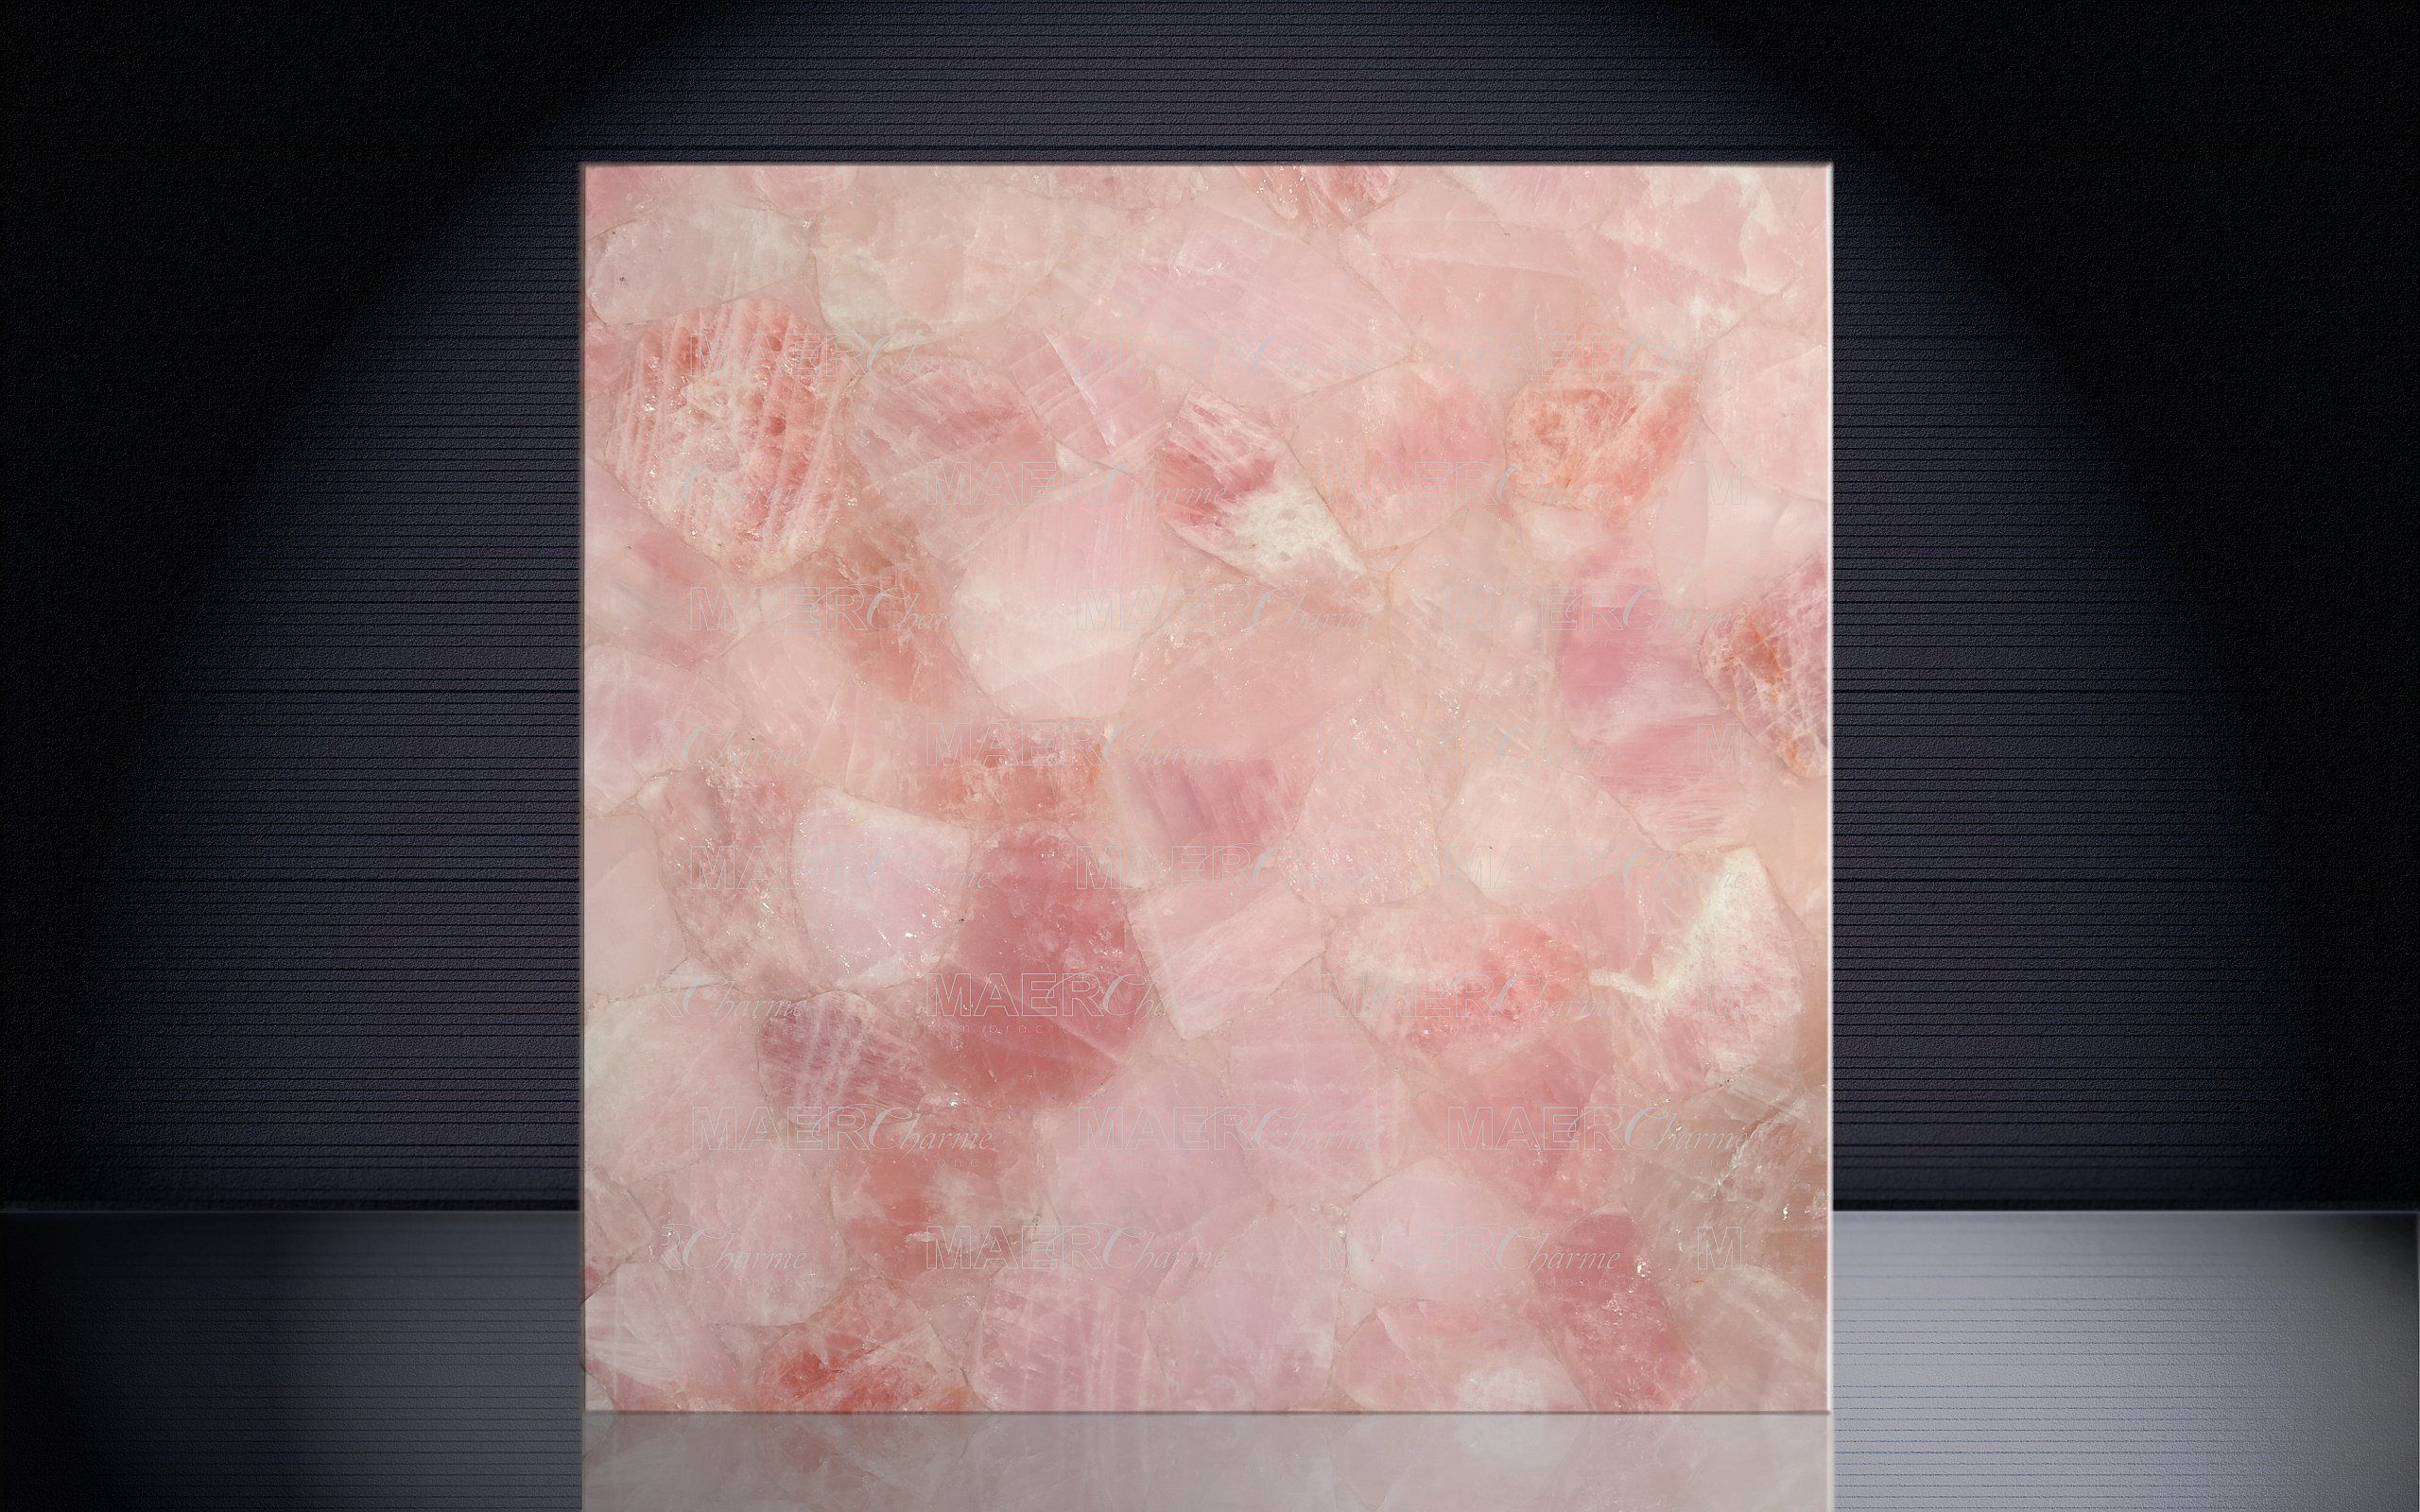 rose quartz polished - Google Search